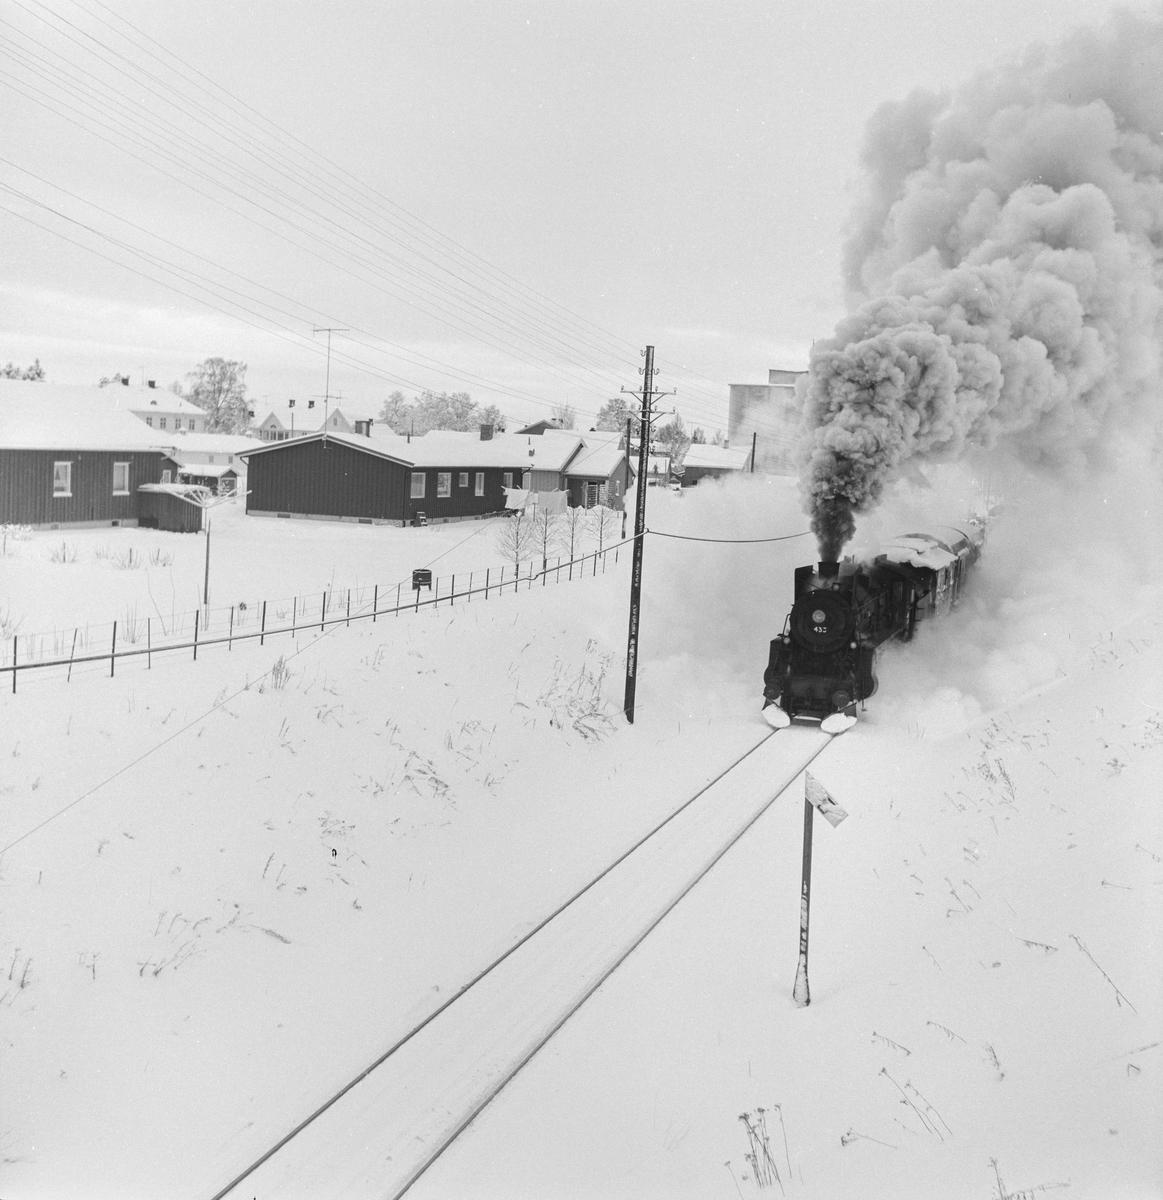 Godstog på Solørbanen trukket av damplokomotiv 26c nr, 433.